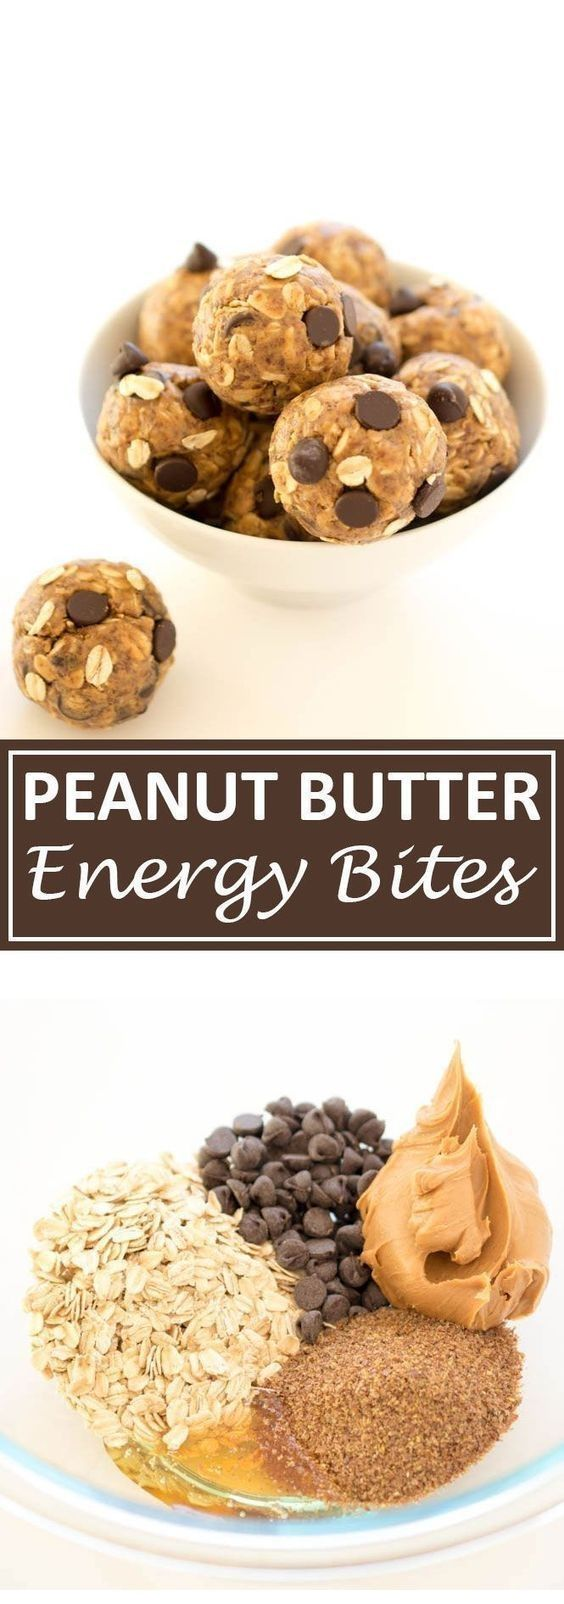 5 Ingredient Peanut Butter Energy Bites #cleaneatingforbeginners